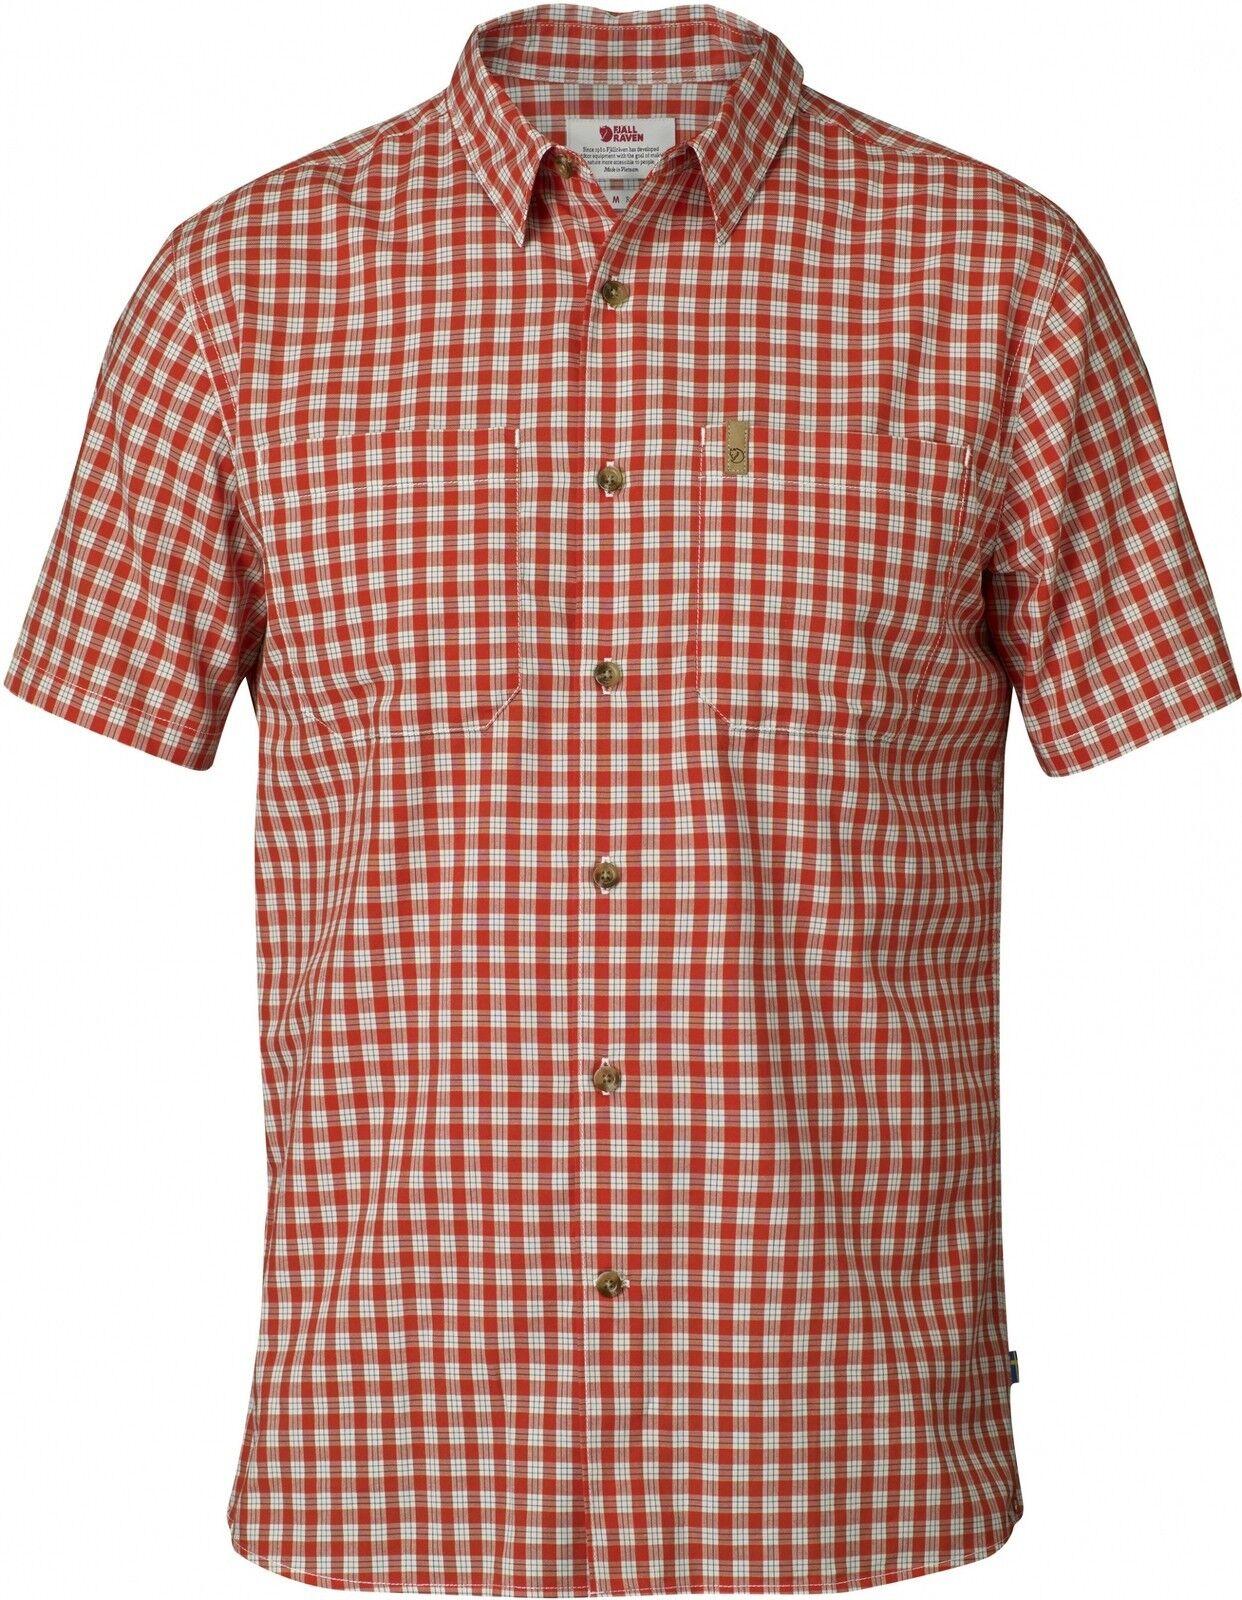 Fjäll Räven High Coast Shirt Funktionshemd SS, Kurzarm-Herrenhemd, flame Orange, Funktionshemd Shirt 3b0224